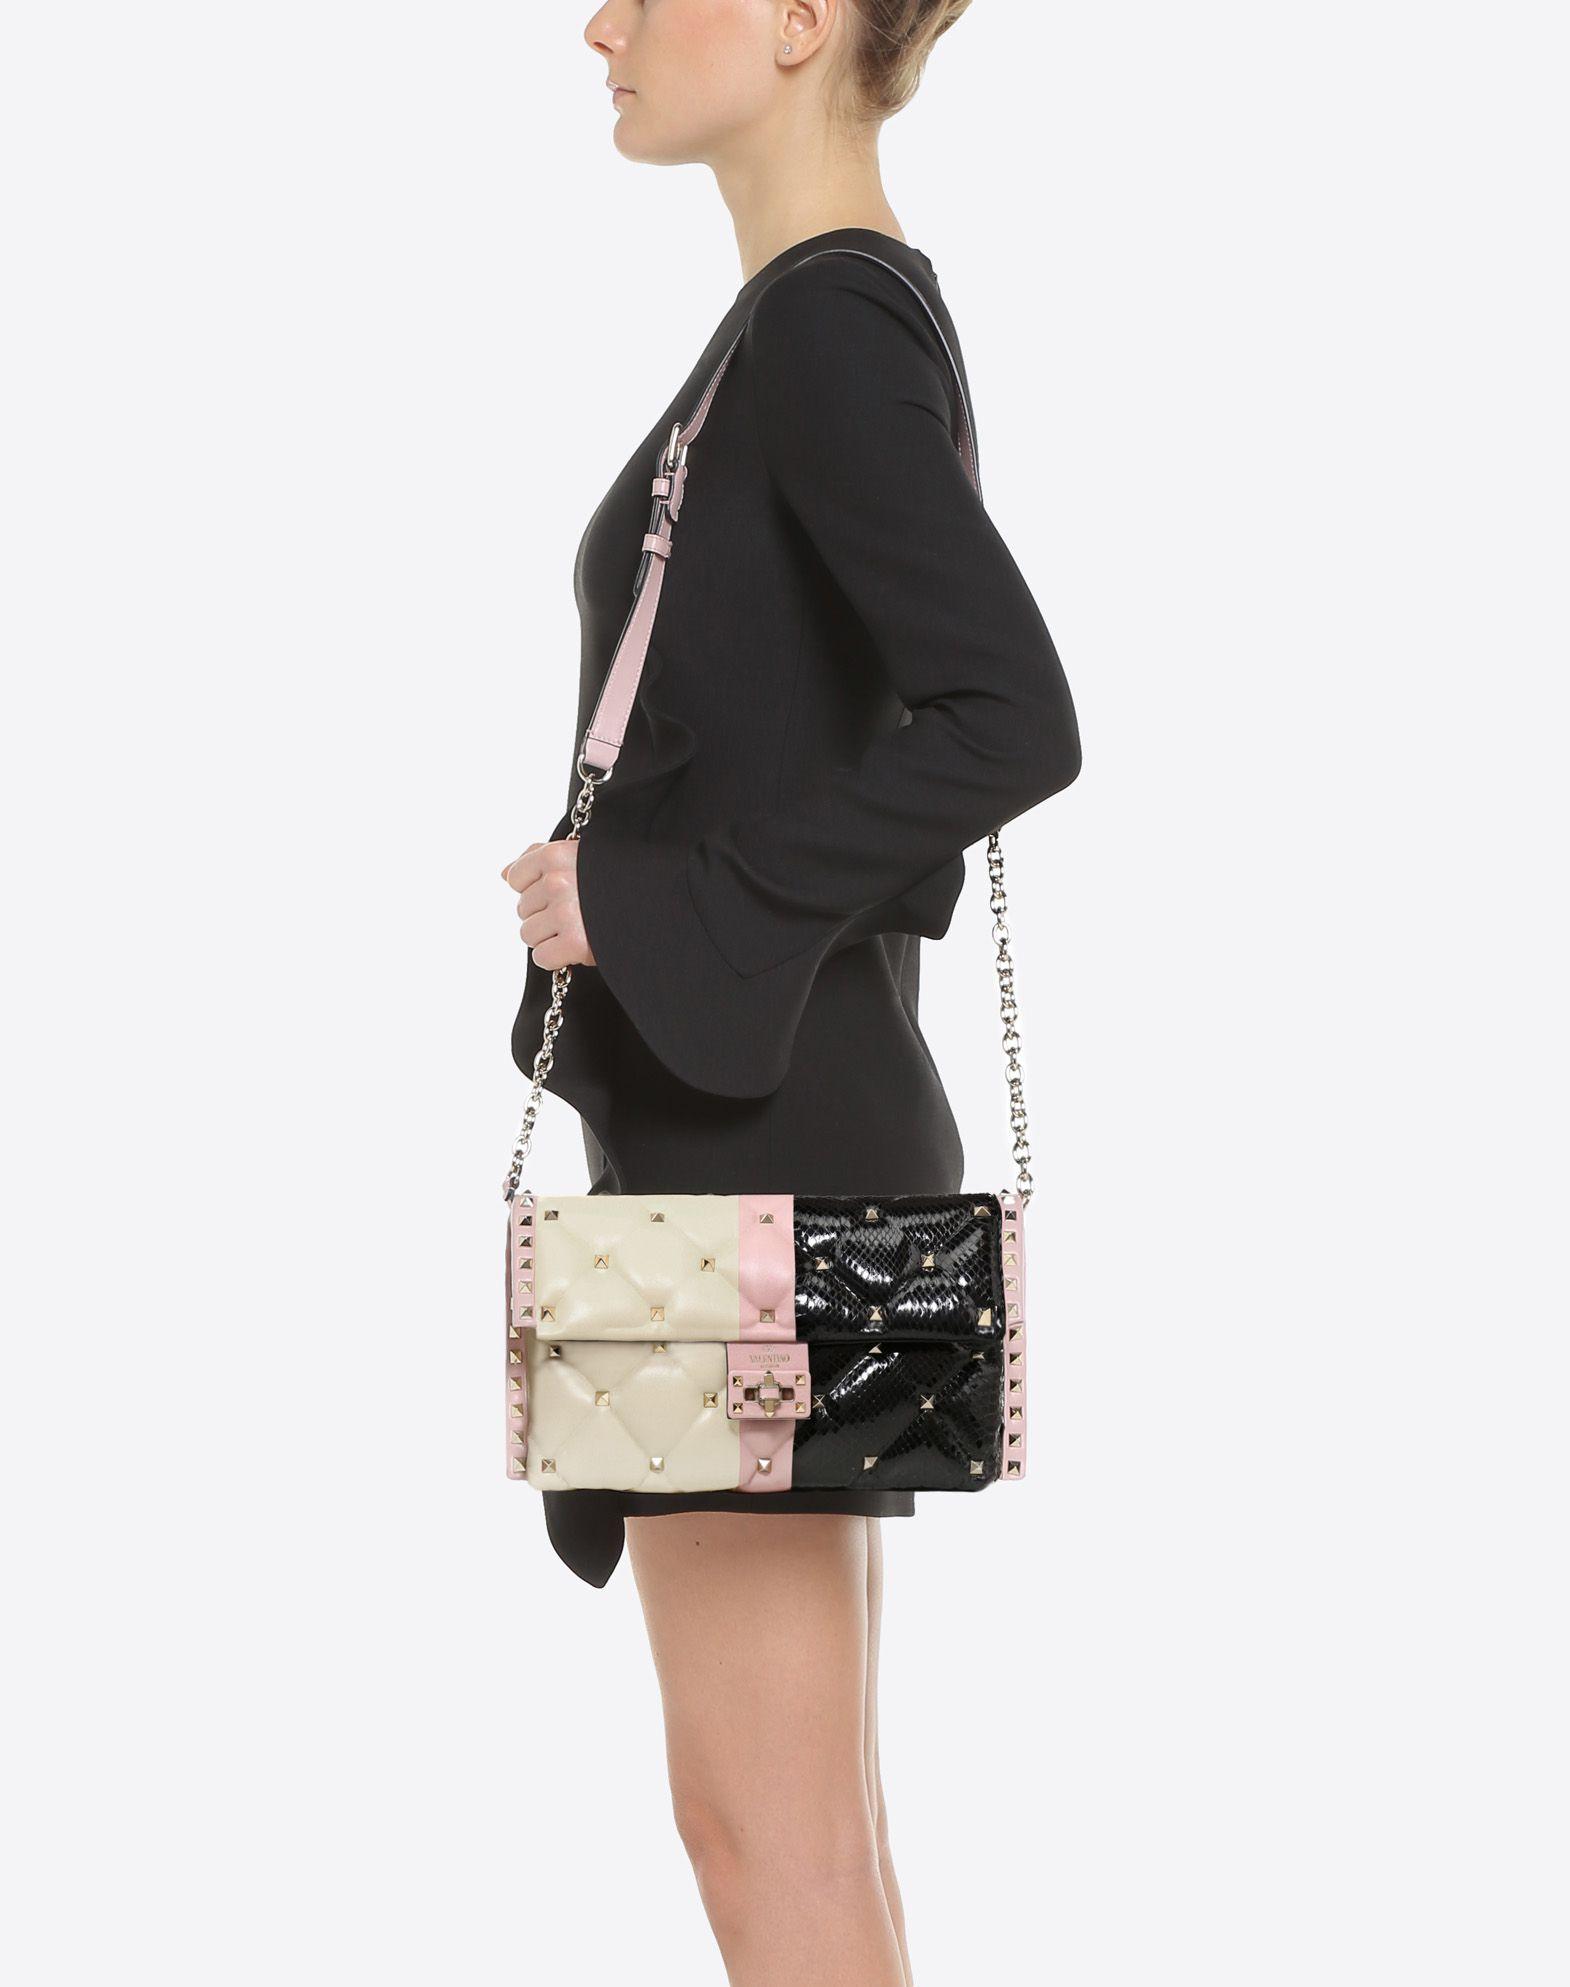 VALENTINO GARAVANI Candystud Cross-body Bag CROSS BODY BAG D a